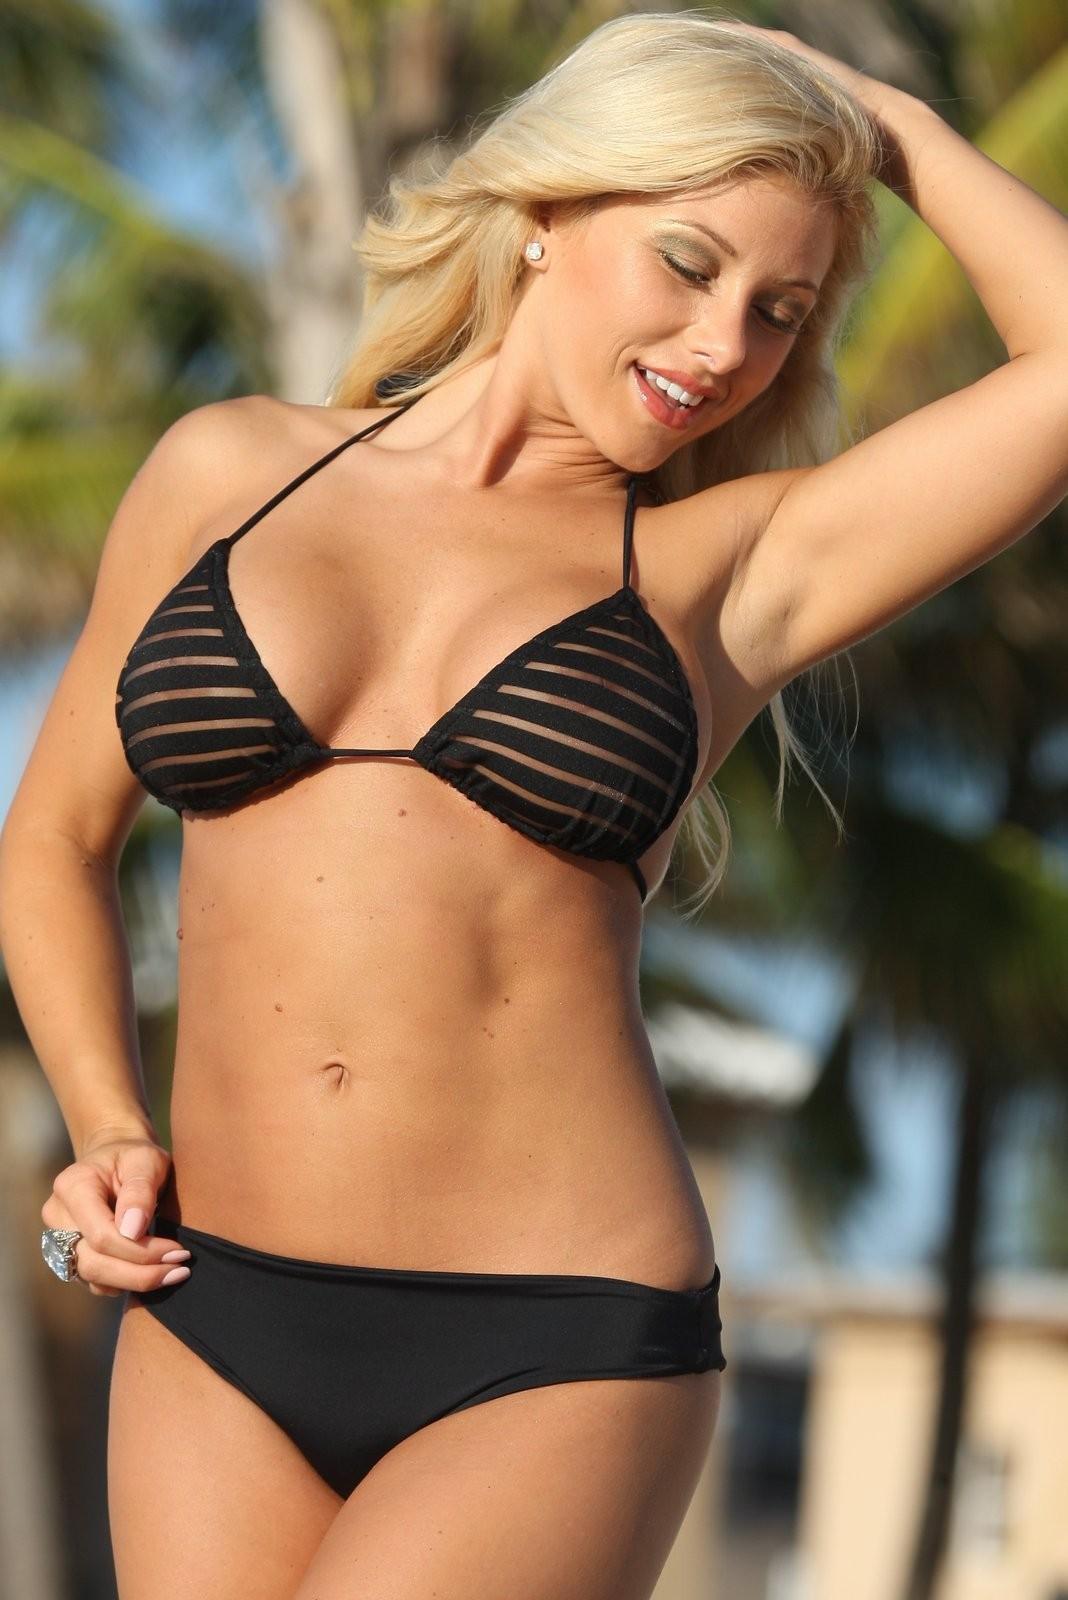 Sexy Black Striped Sheer Lingerie Style Romantic Bikini